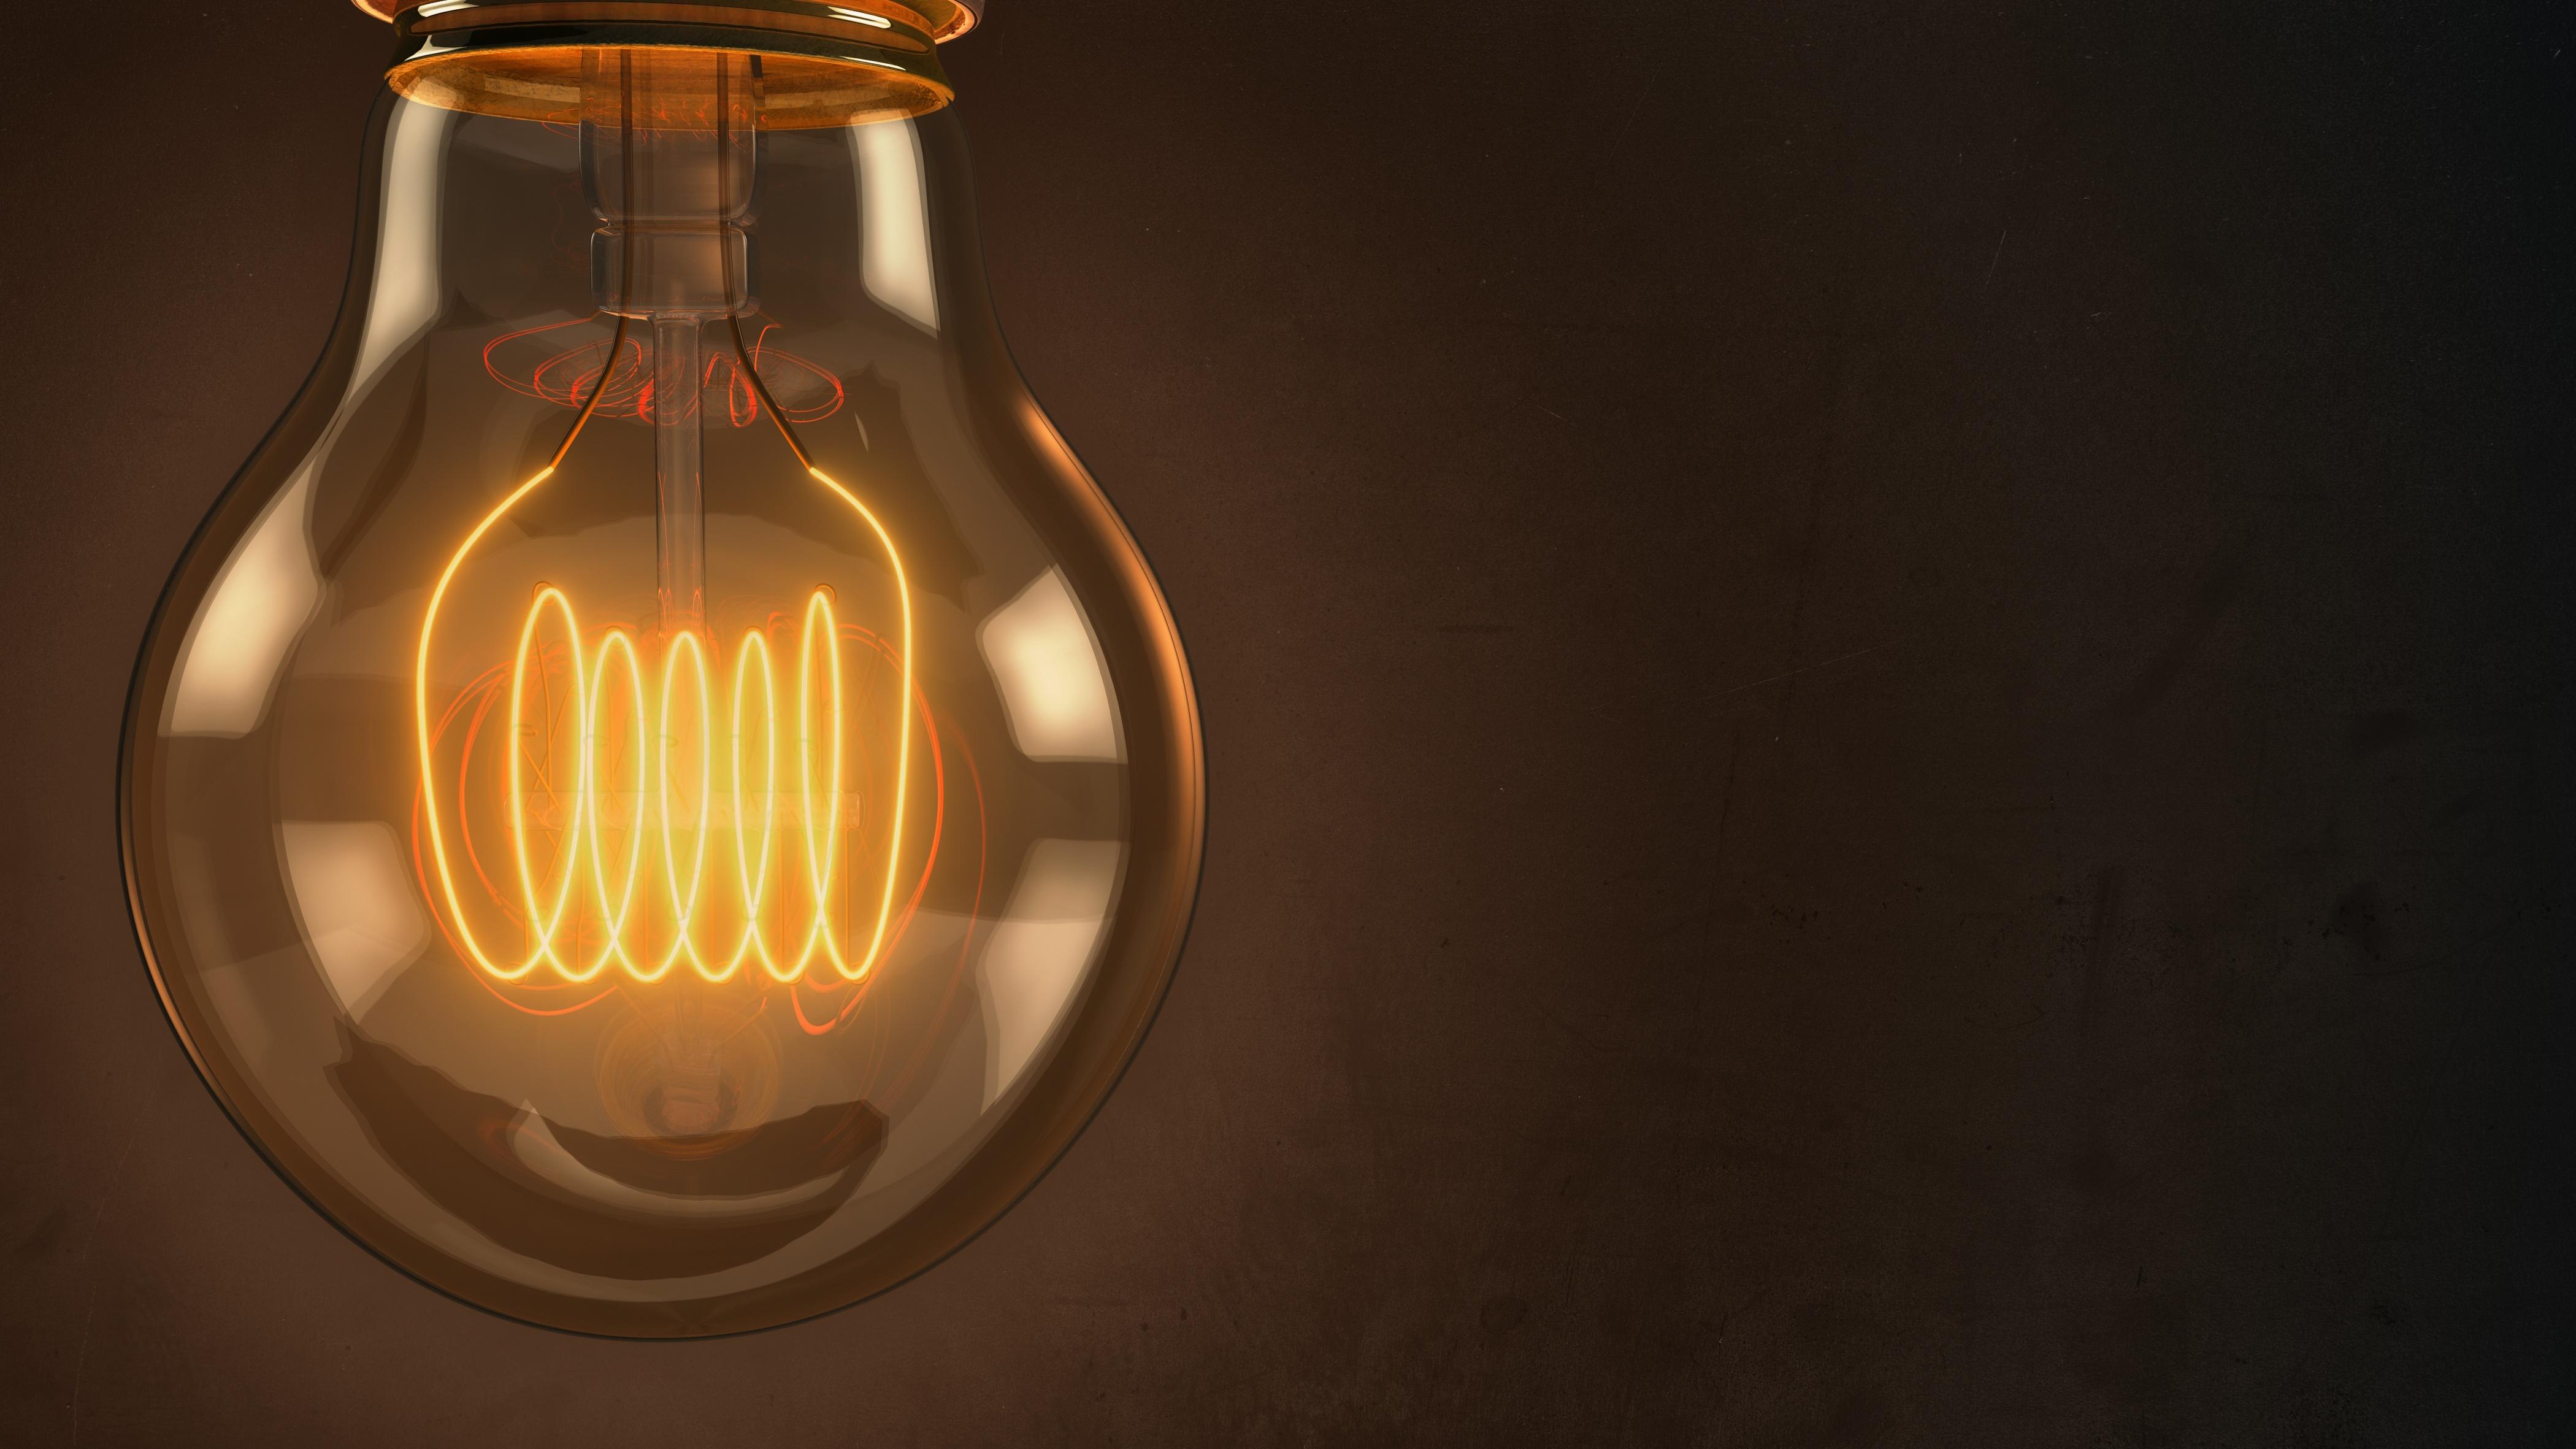 Washington Electrical Contractor License